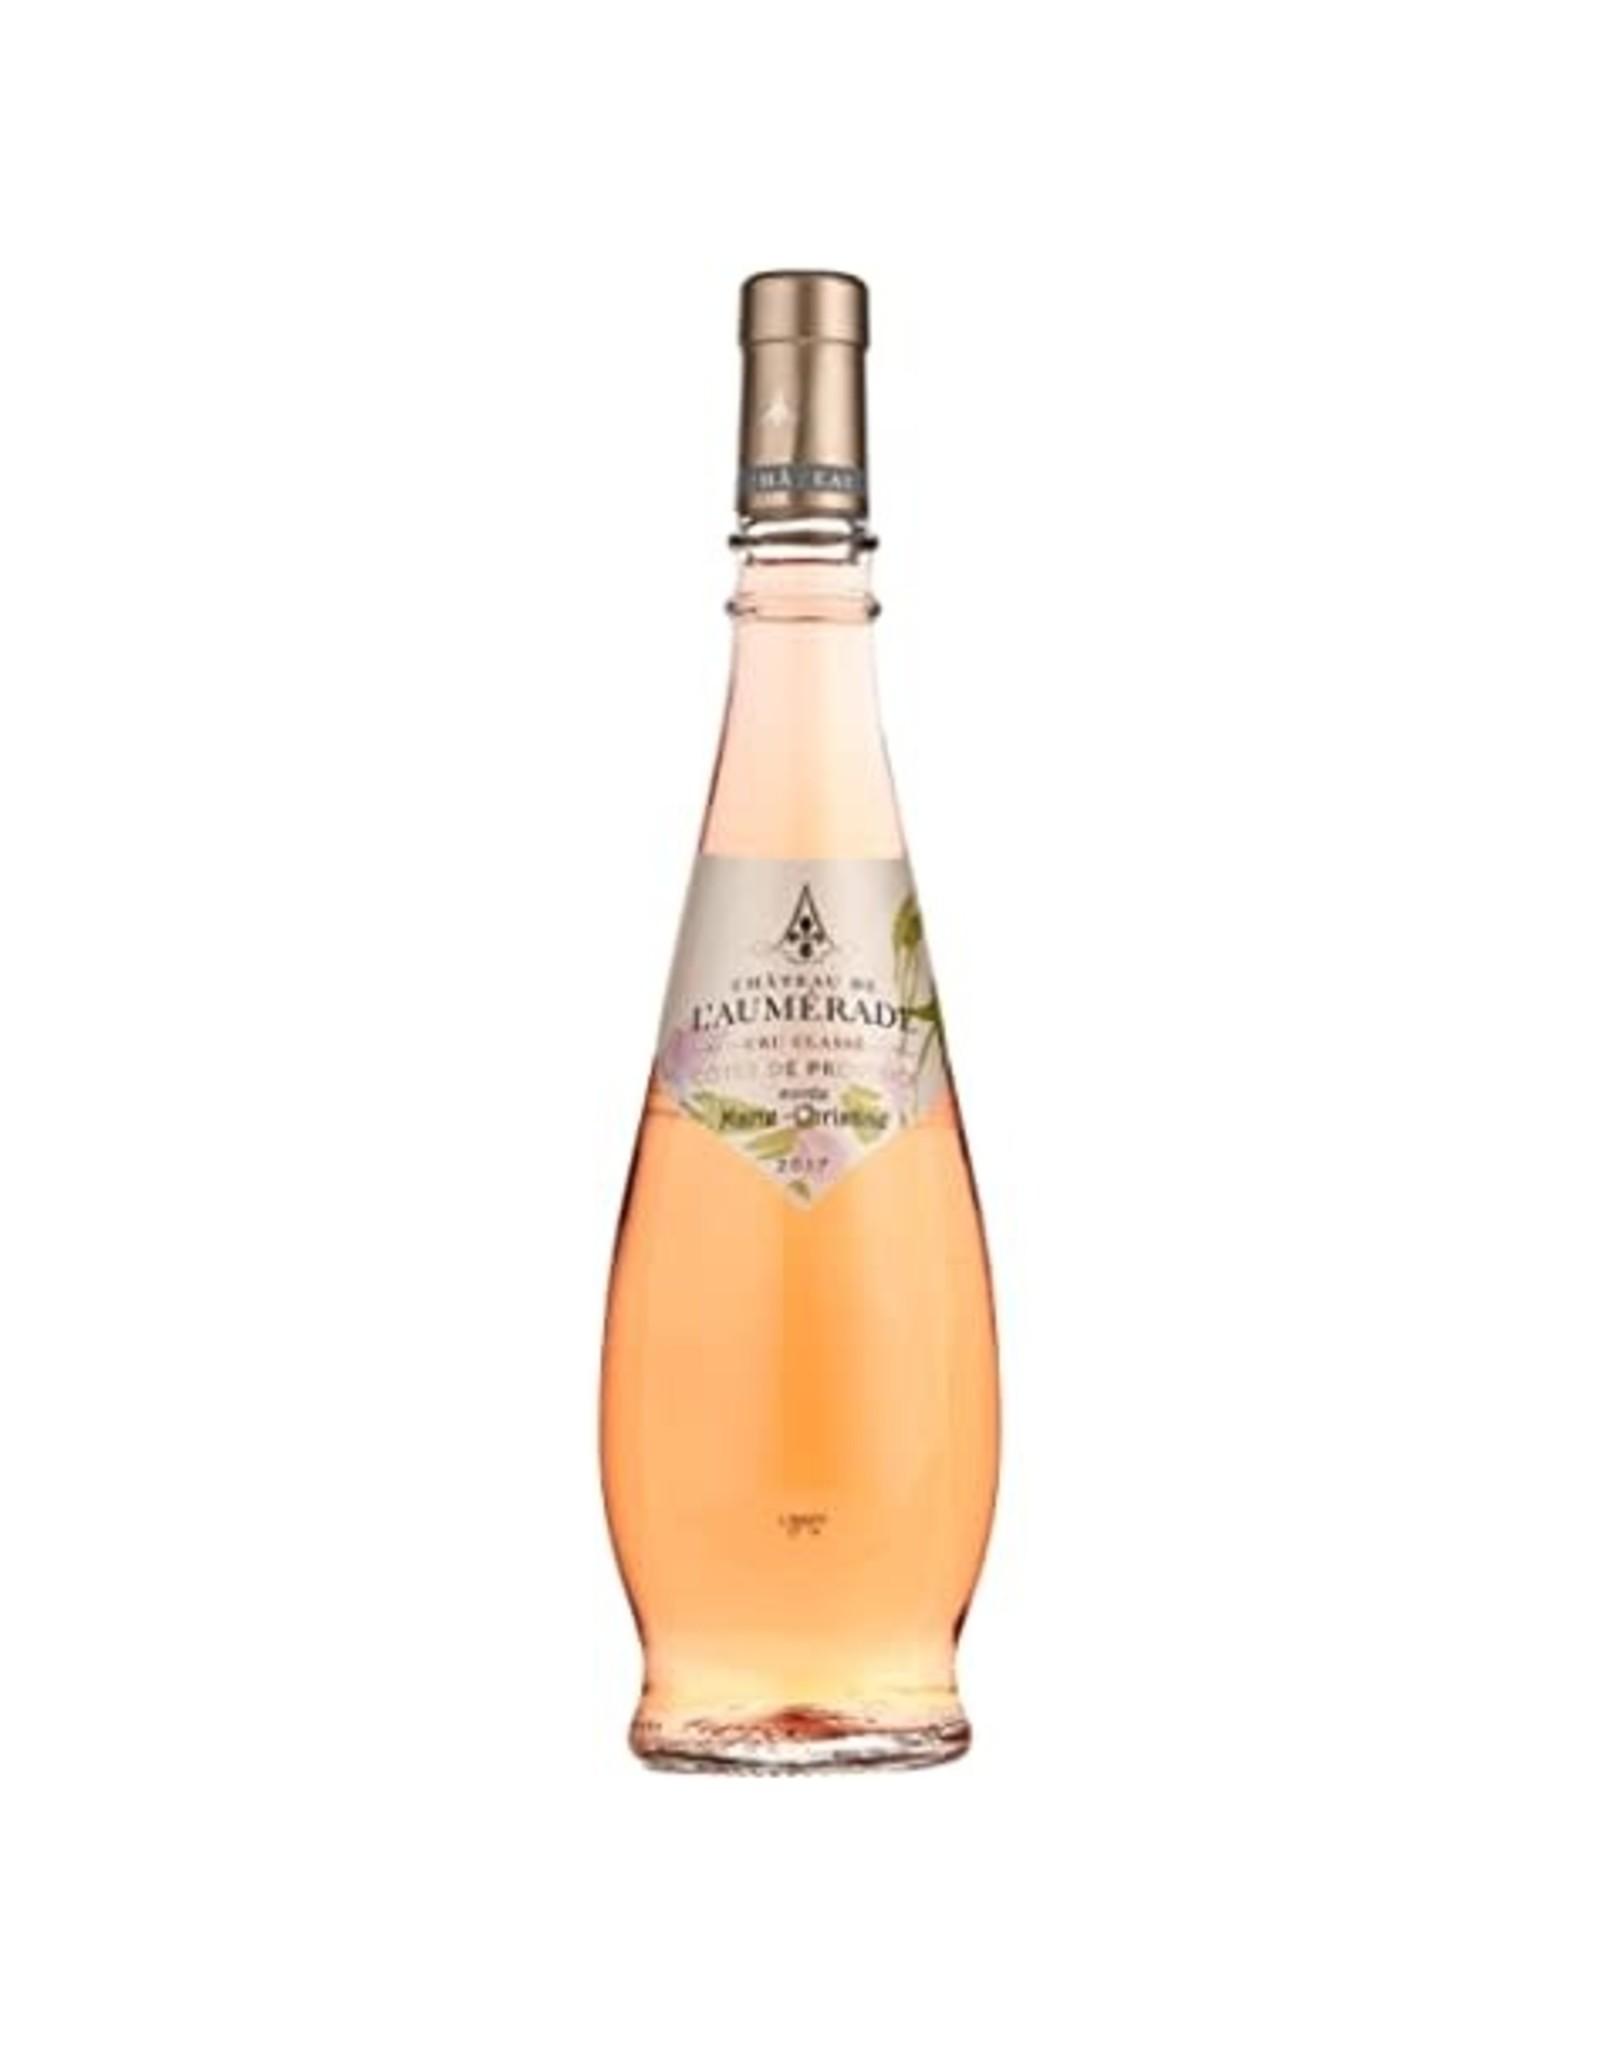 France Ch. de L'Aumerade Cotes de Provence Cru Classe Rose